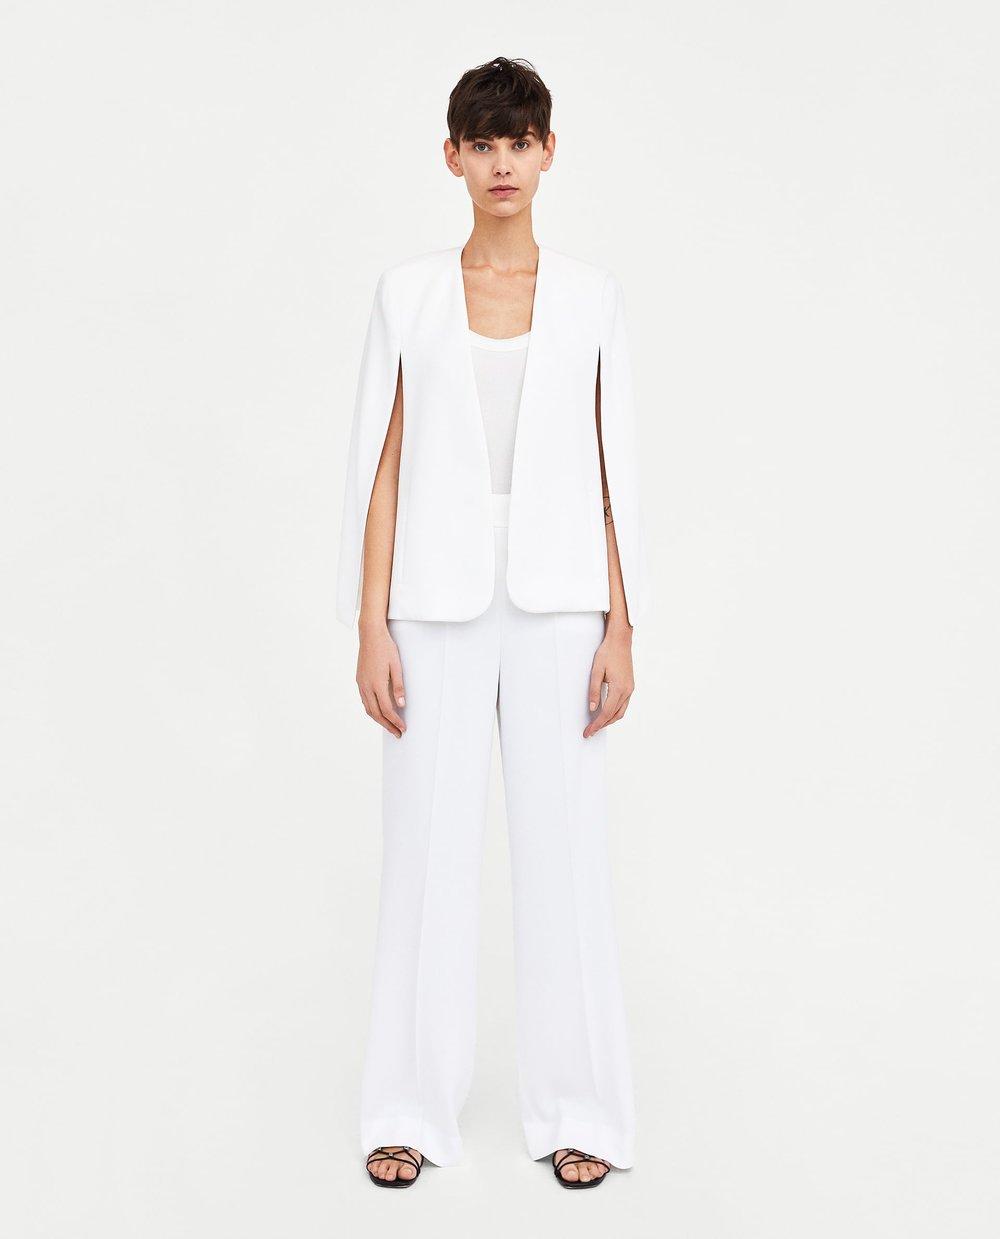 Zara_white cape jacket.jpg